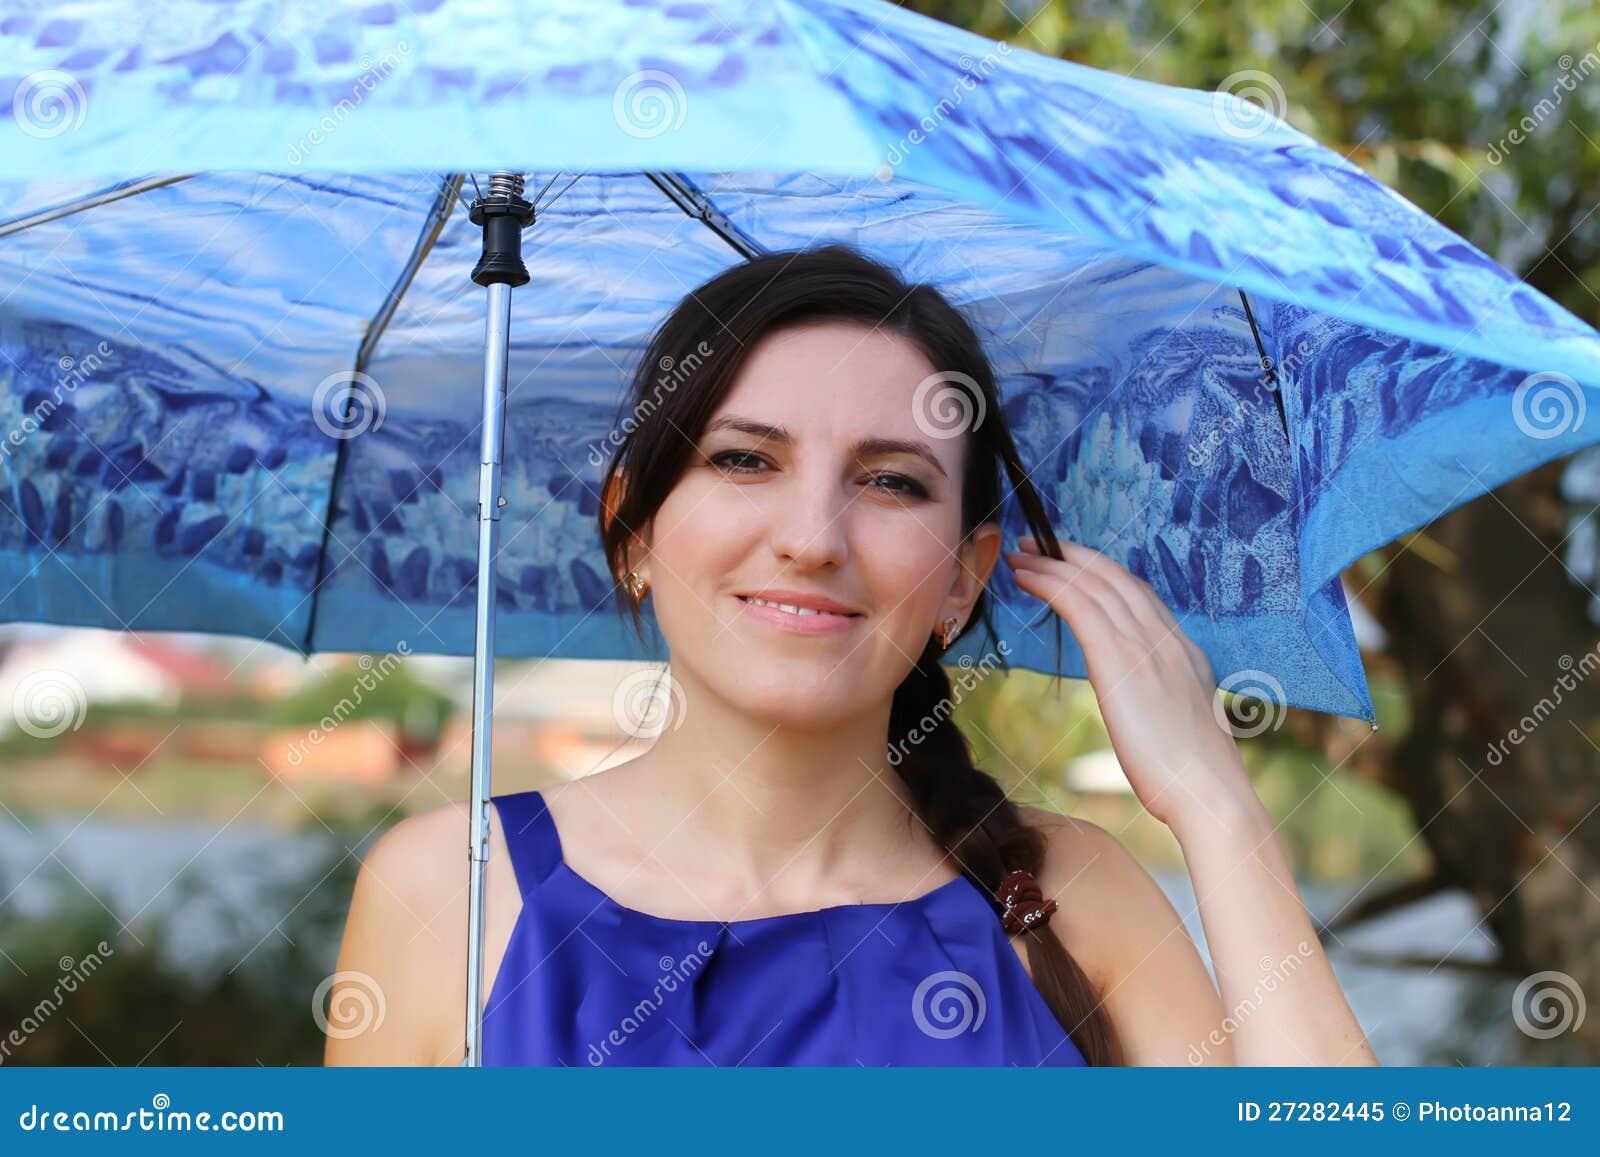 Girl With Umbrella Royalty Free Stock Photo - Image: 27282445